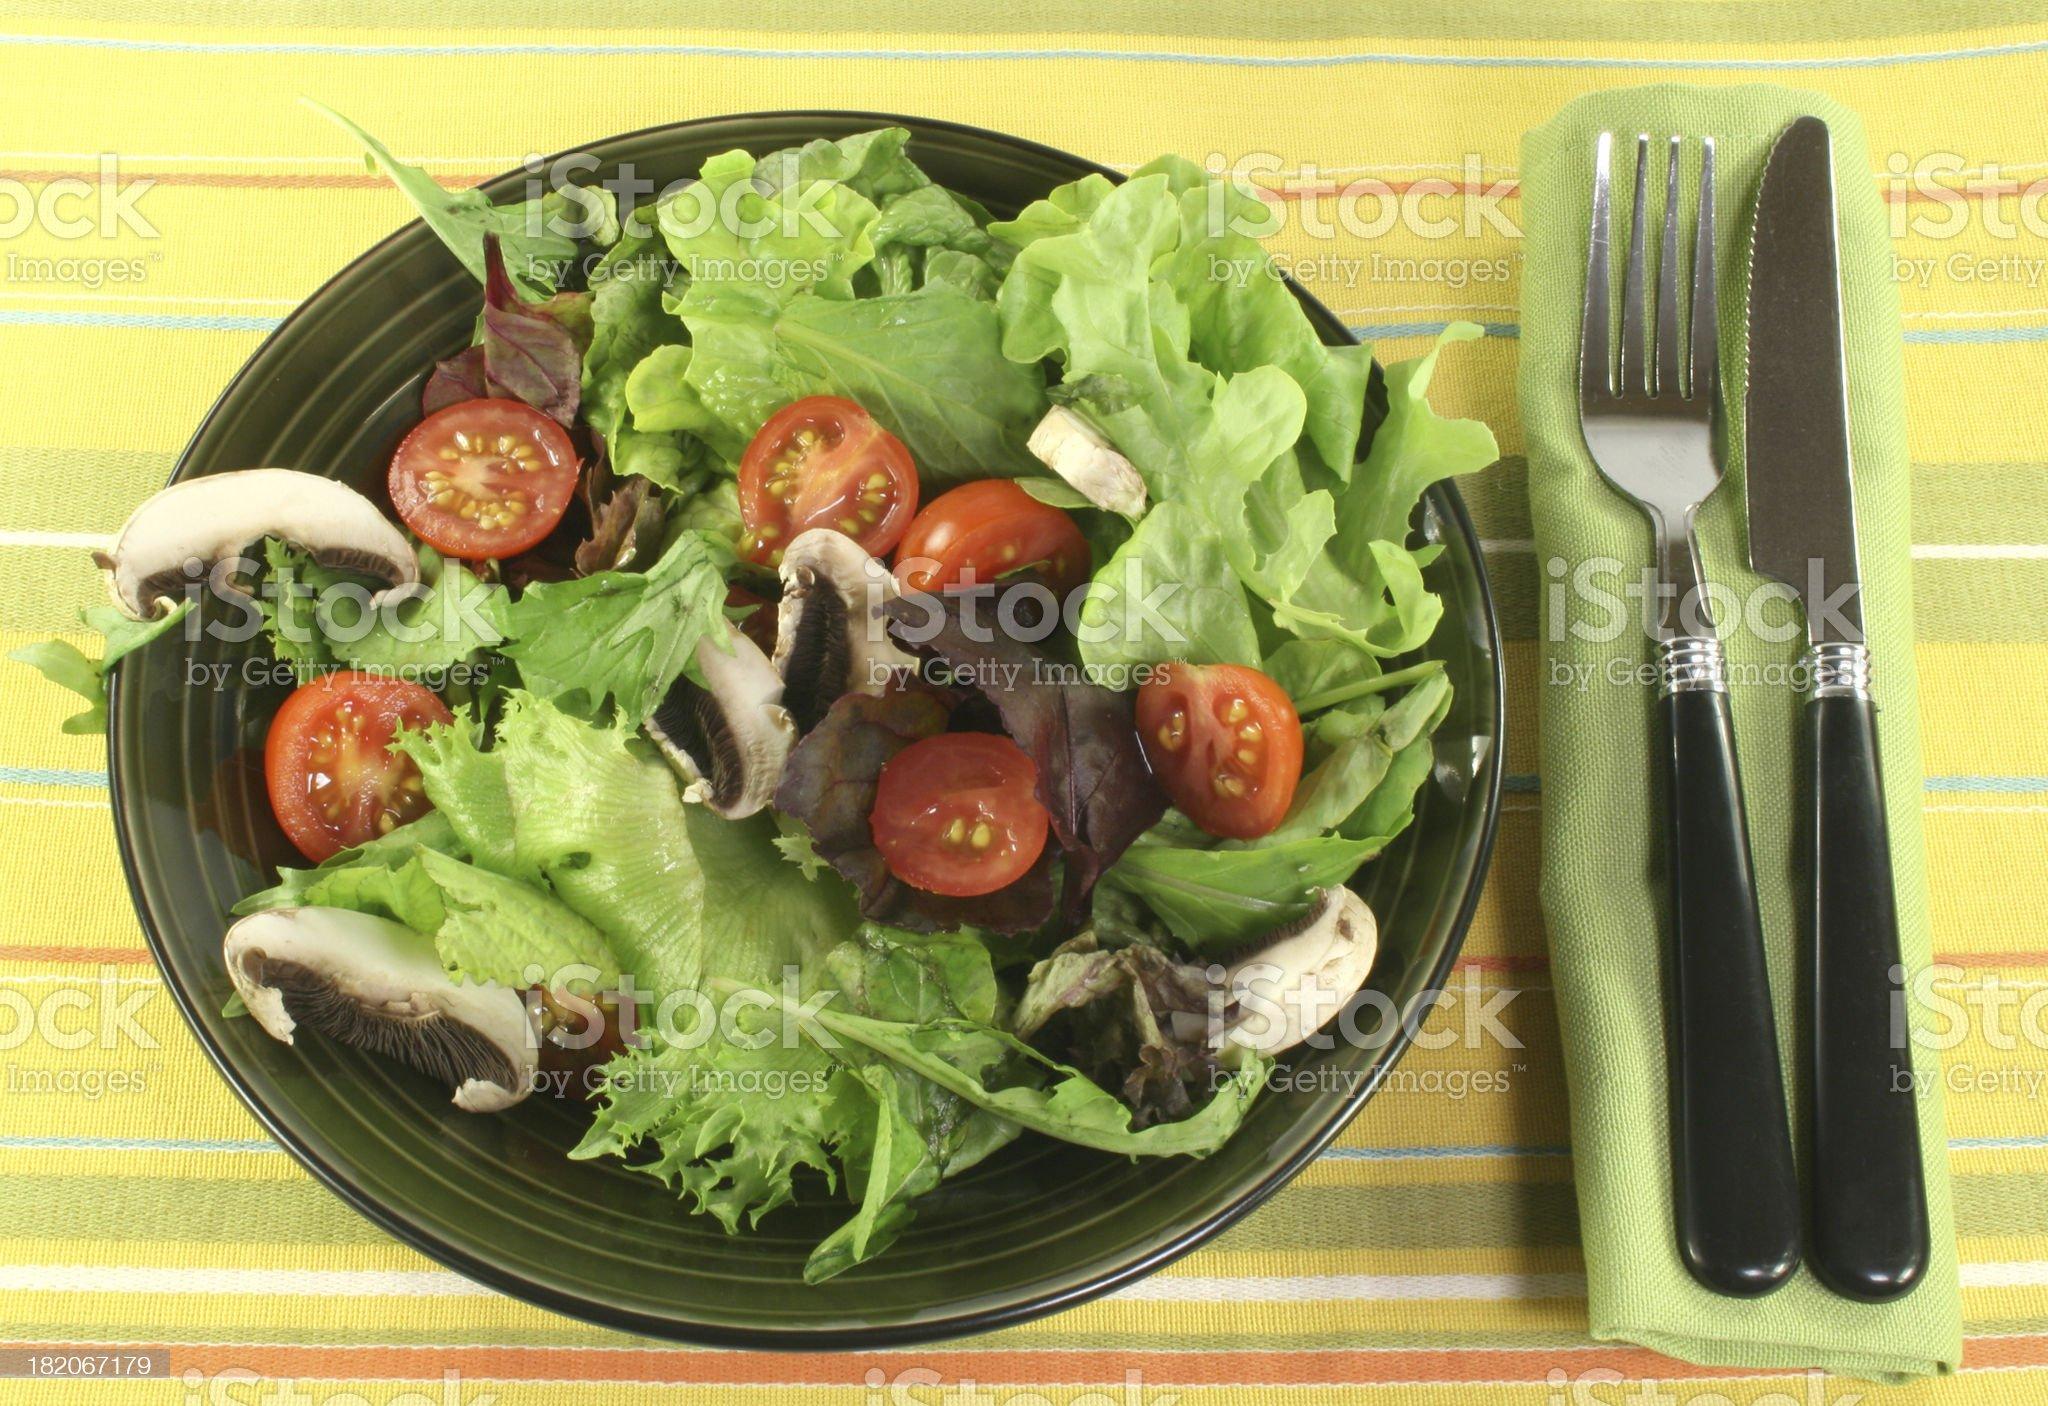 salad with tomatos, greens and mushrooms royalty-free stock photo